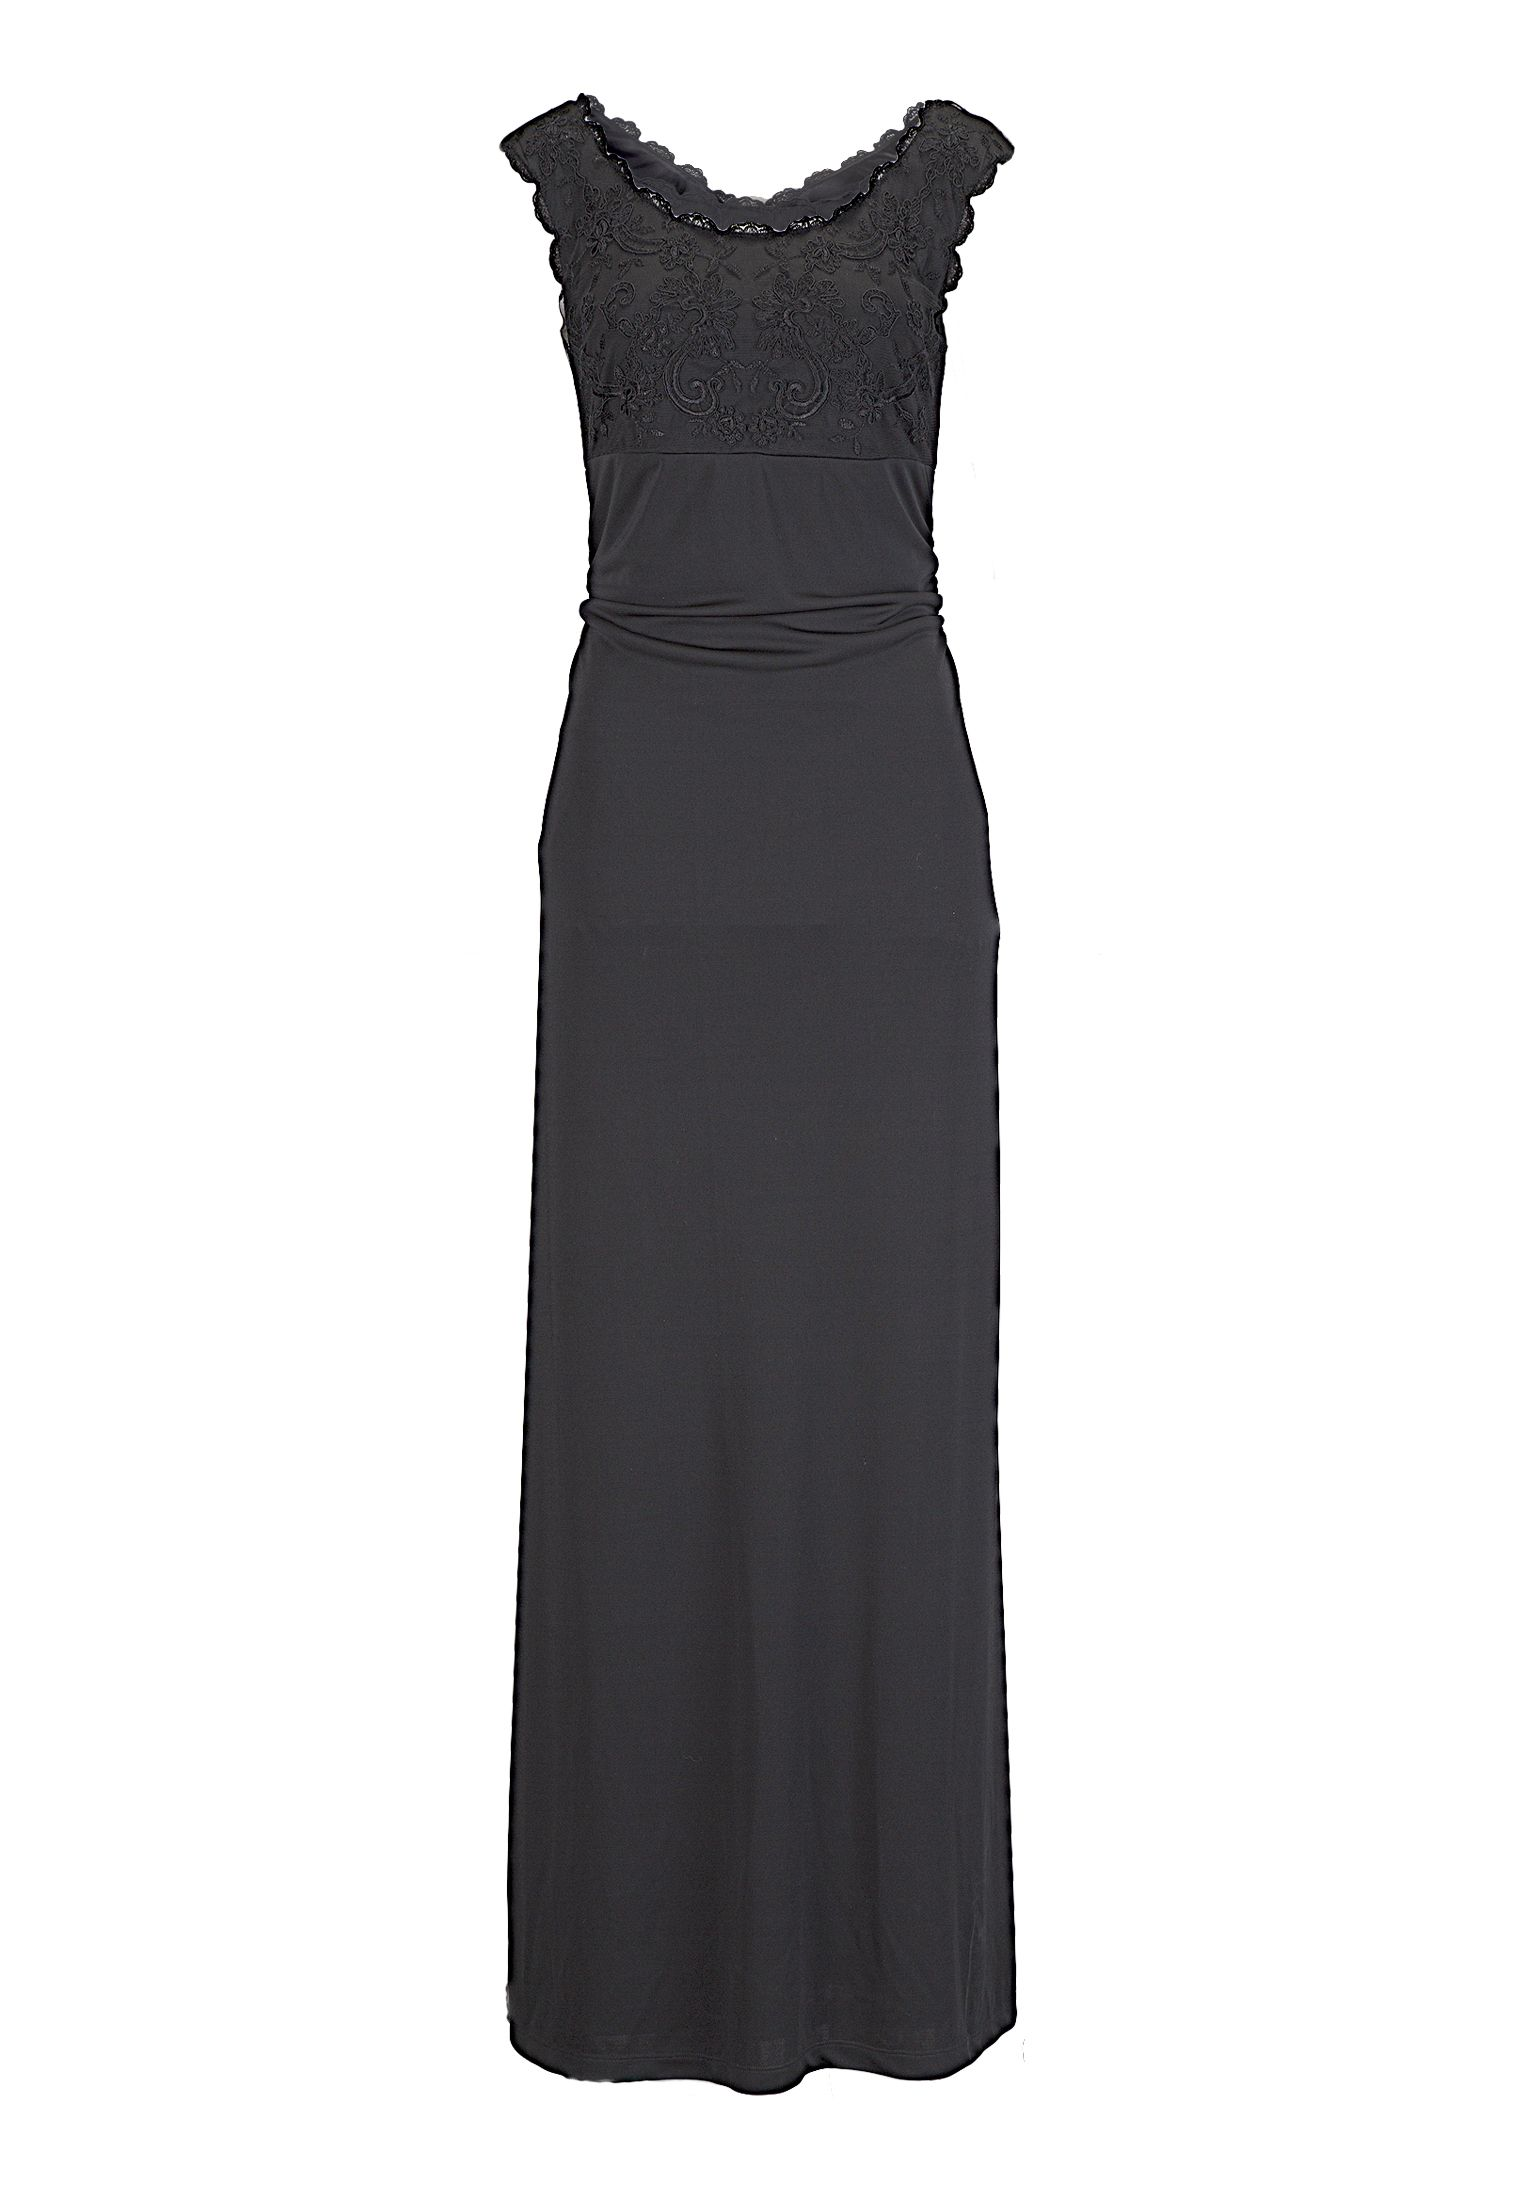 Vera mont abendkleid lang schwarz